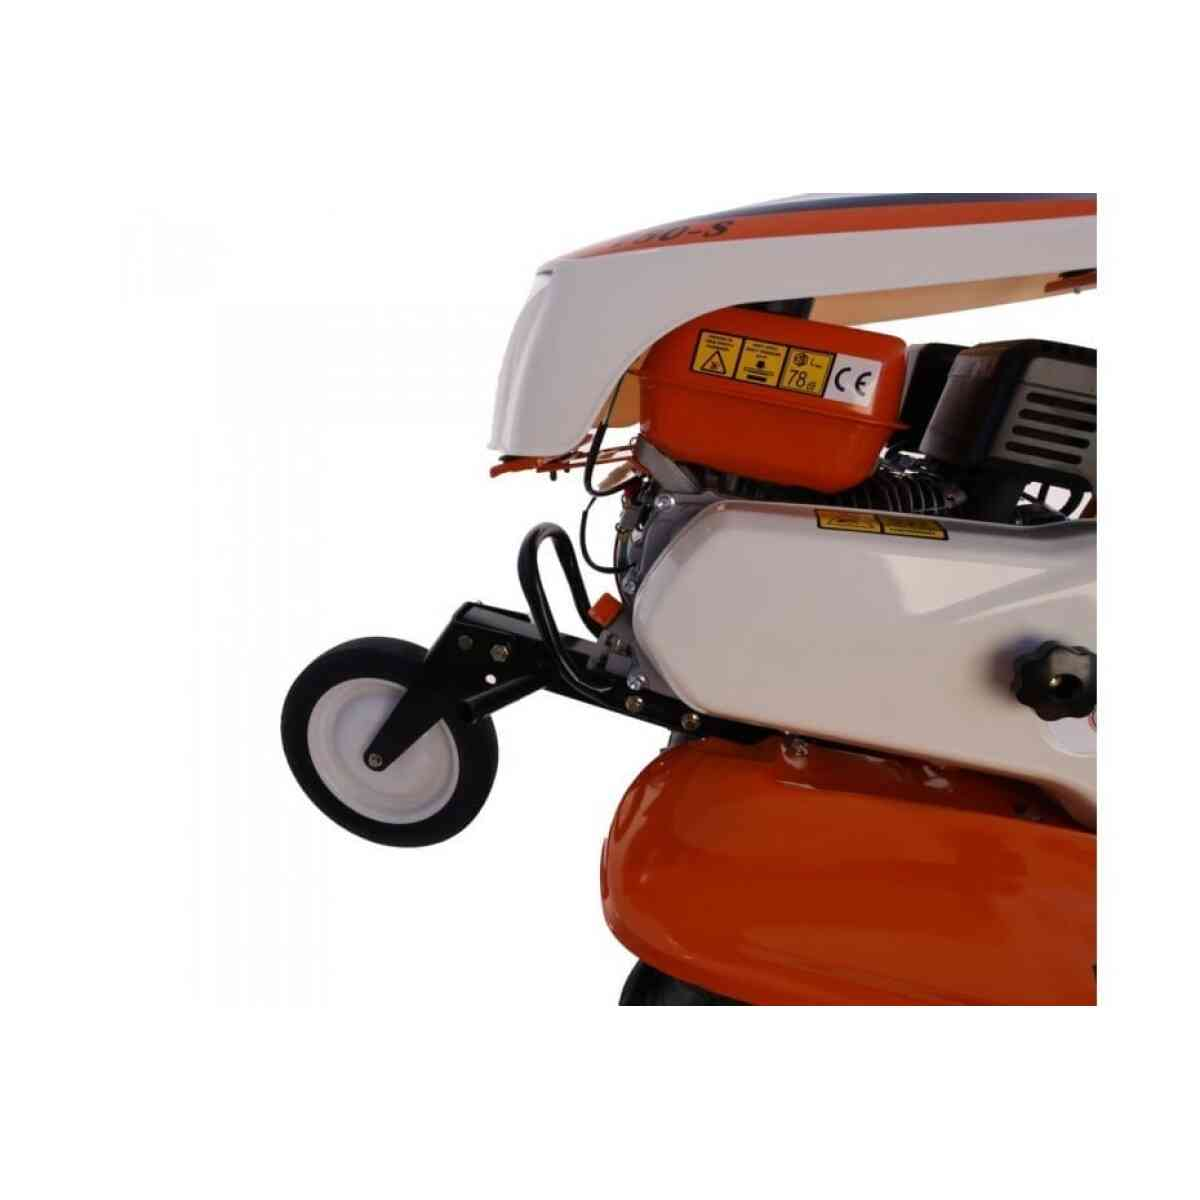 motocultor o mac 750s o mac.ro 005 1 33